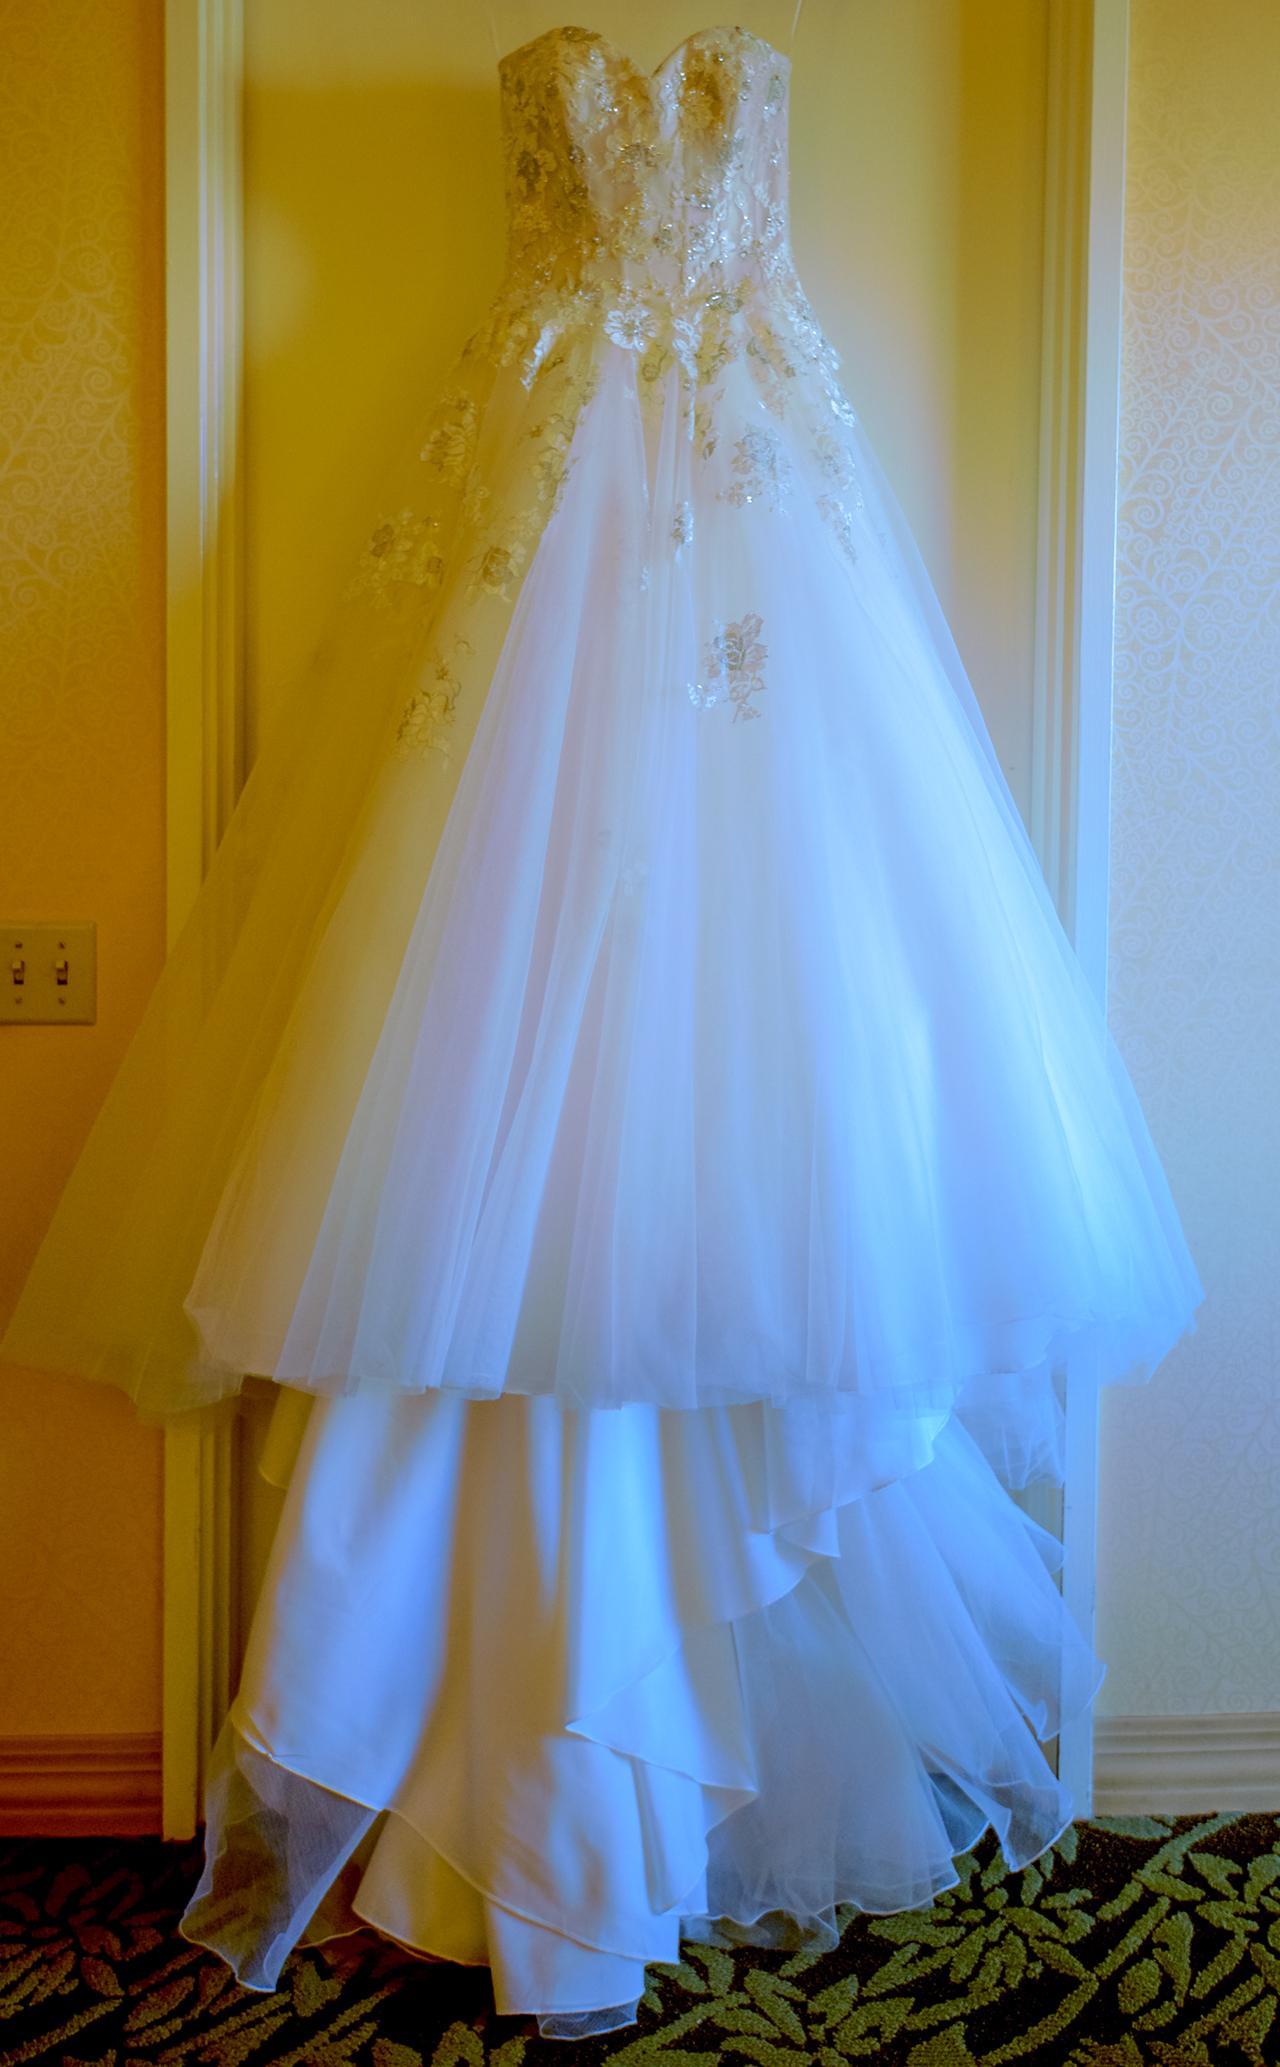 Brides wedding dress at Hilton Hawaiian Village